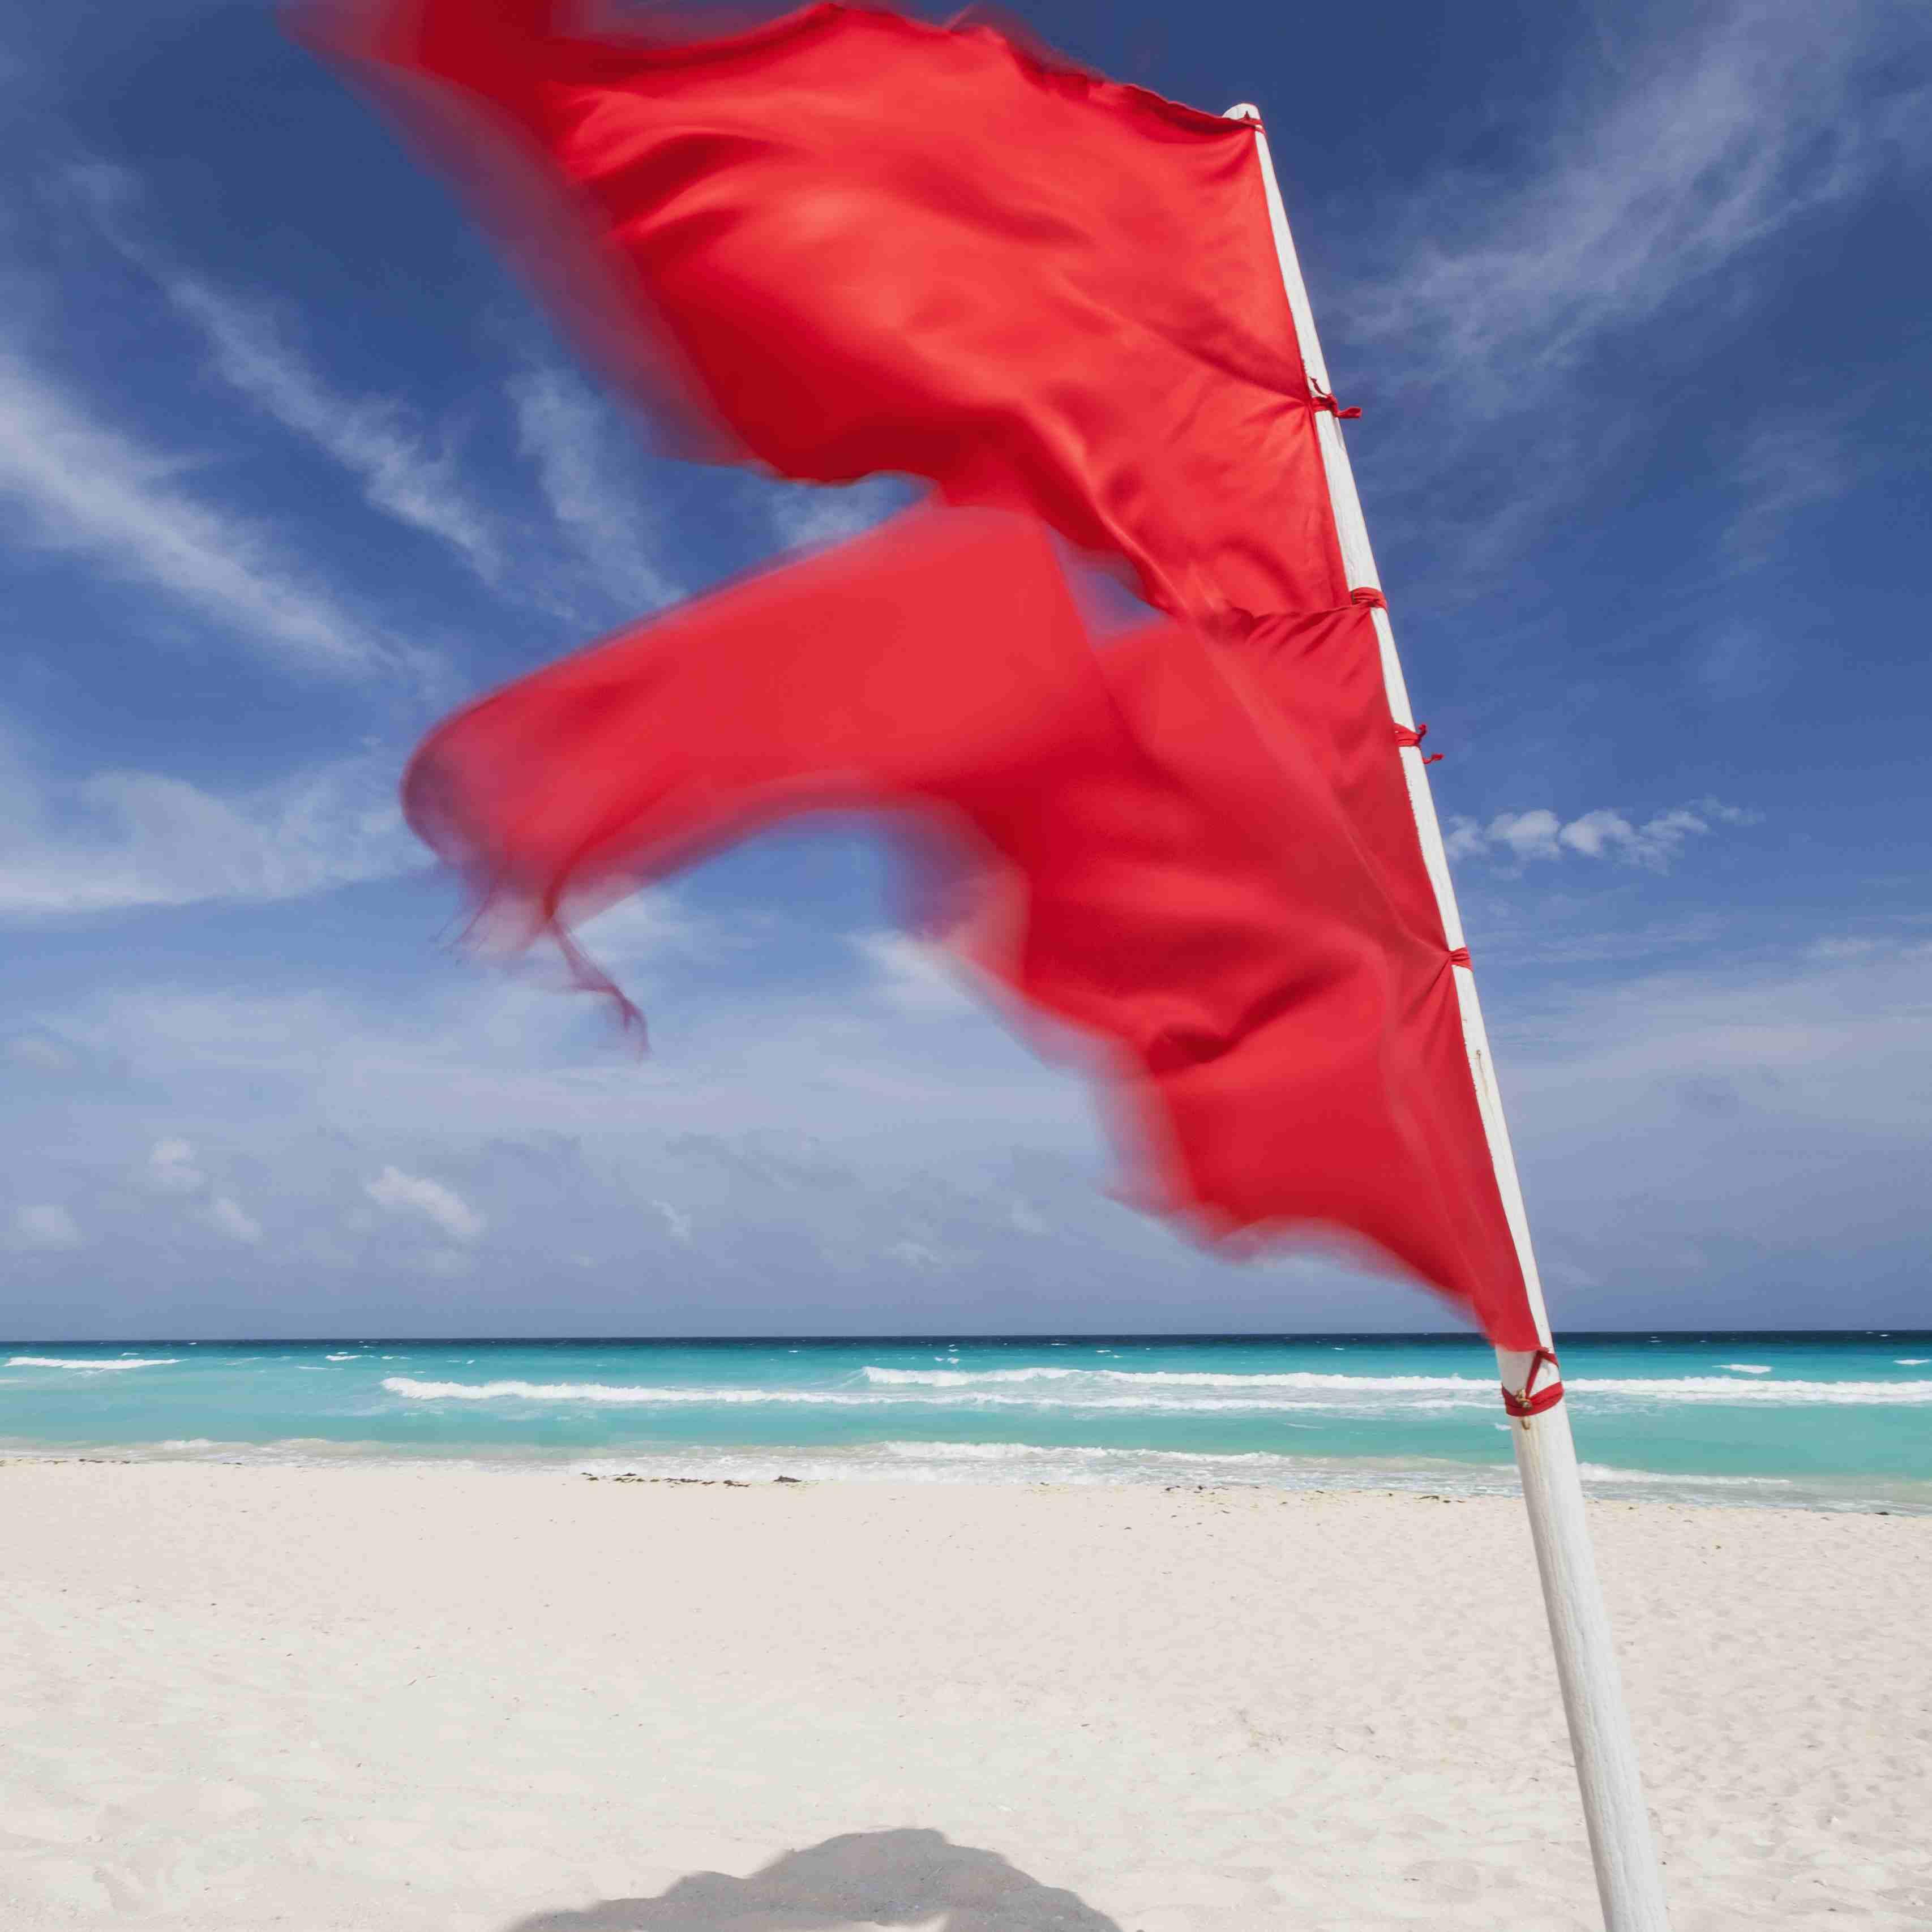 Mexico, Quintana Roo, Yucatan Peninsula, Cancun, Red flag on beach